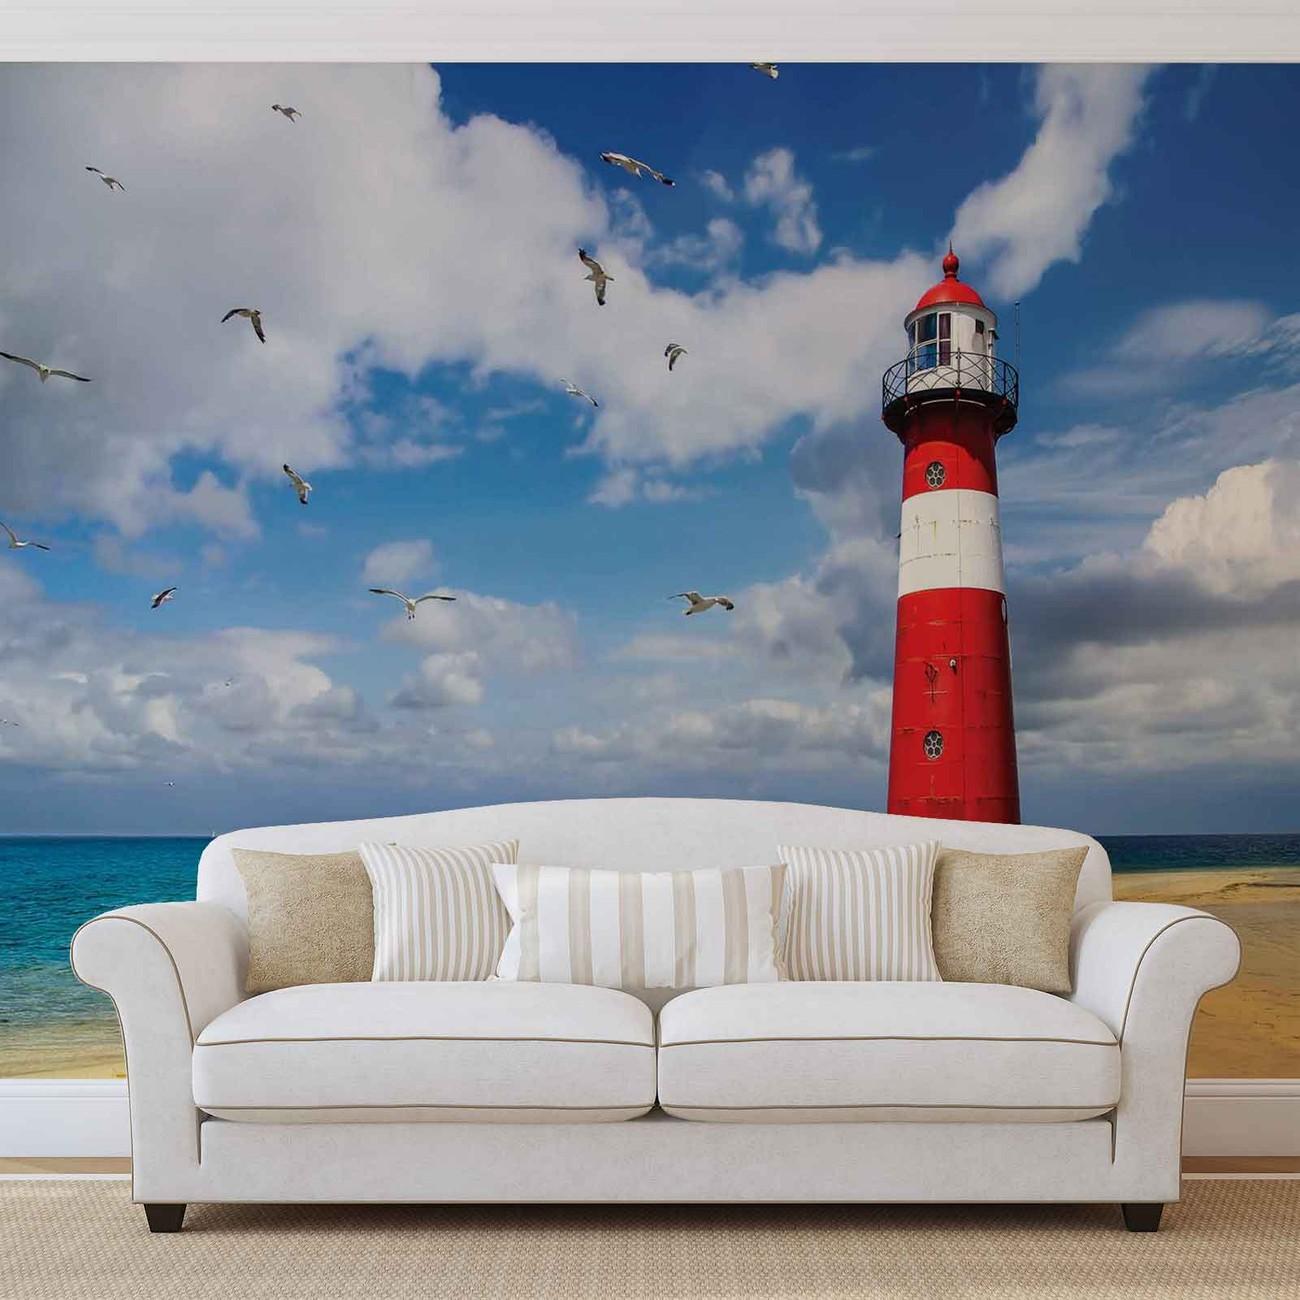 lighthouse beach wall mural buy at europosters zen huge wall mural art print poster wallpaper mural at